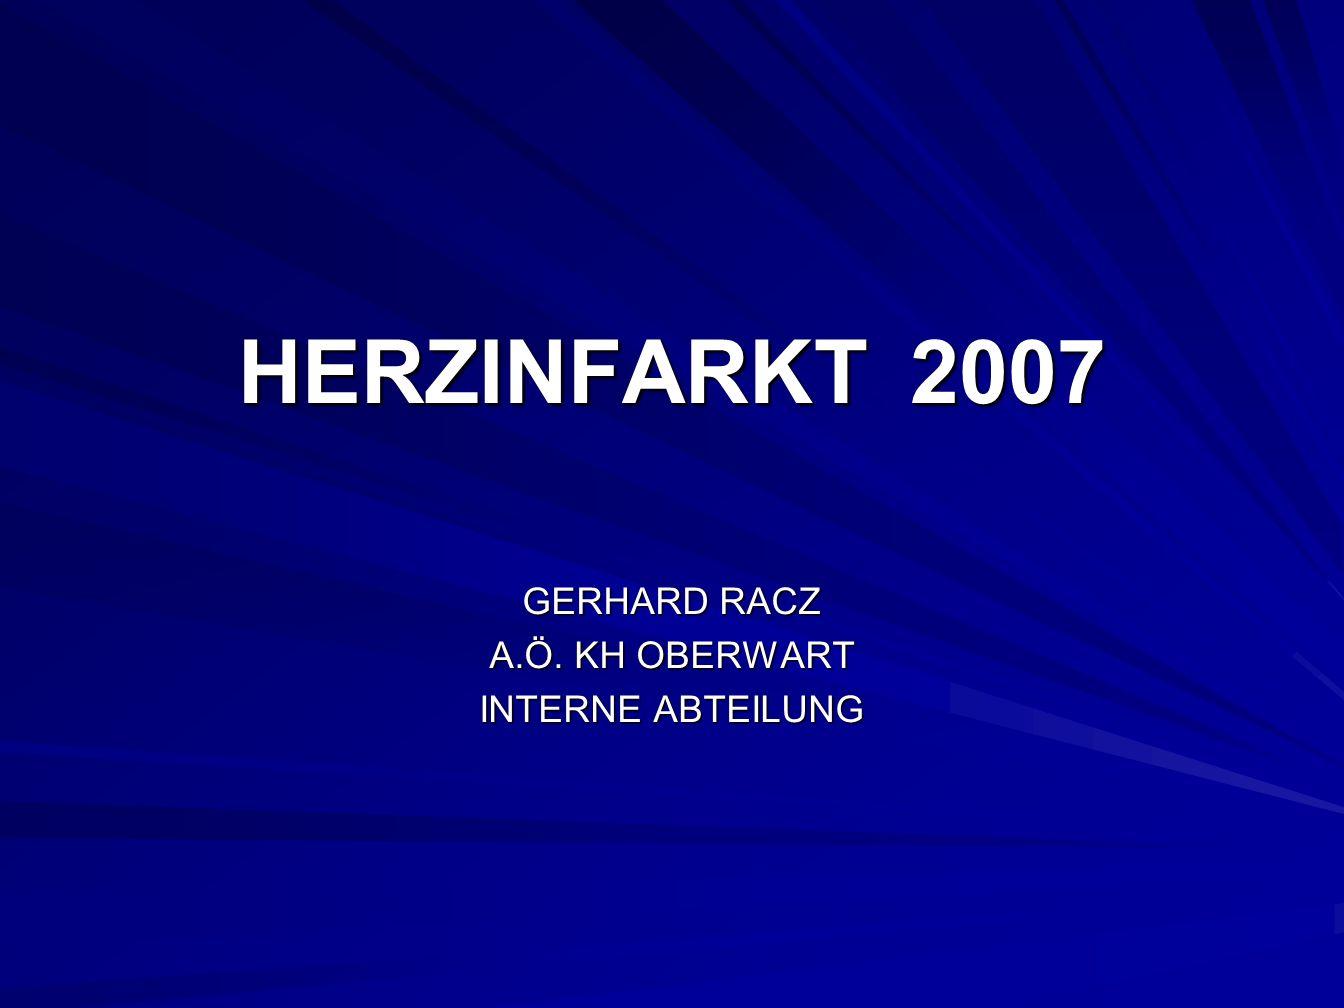 HERZINFARKT 2007 GERHARD RACZ A.Ö. KH OBERWART INTERNE ABTEILUNG